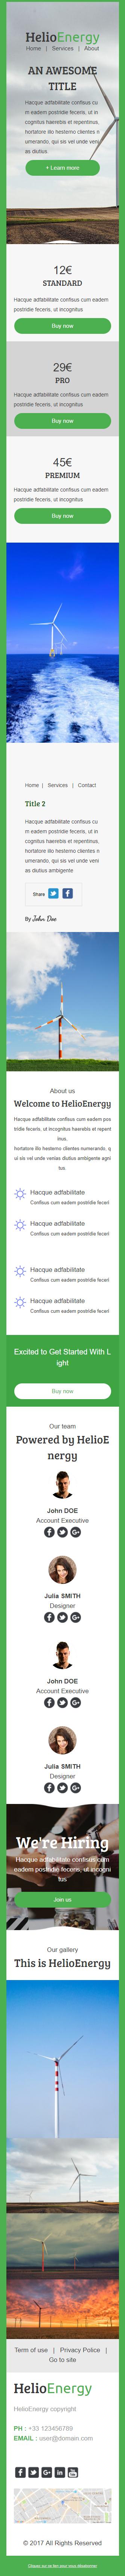 Templates Emailing Helio Energy Sarbacane